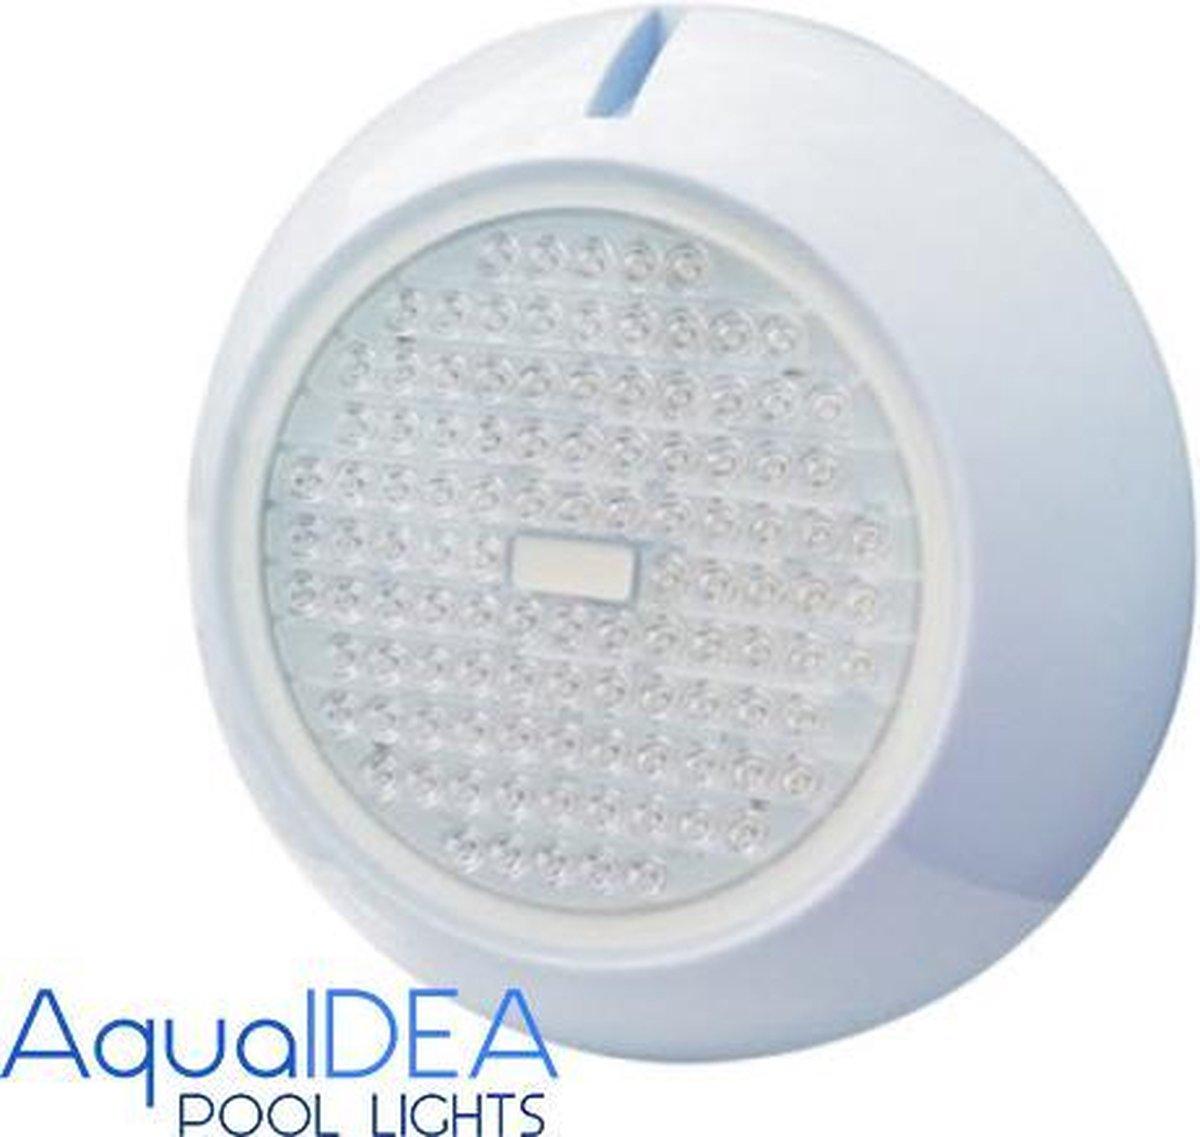 AquaIDEA - Swimming POOL LED Light - WARMWHITE - Type P120 20 Watt 108 SMD LEDs - AC/DC12V- IP68